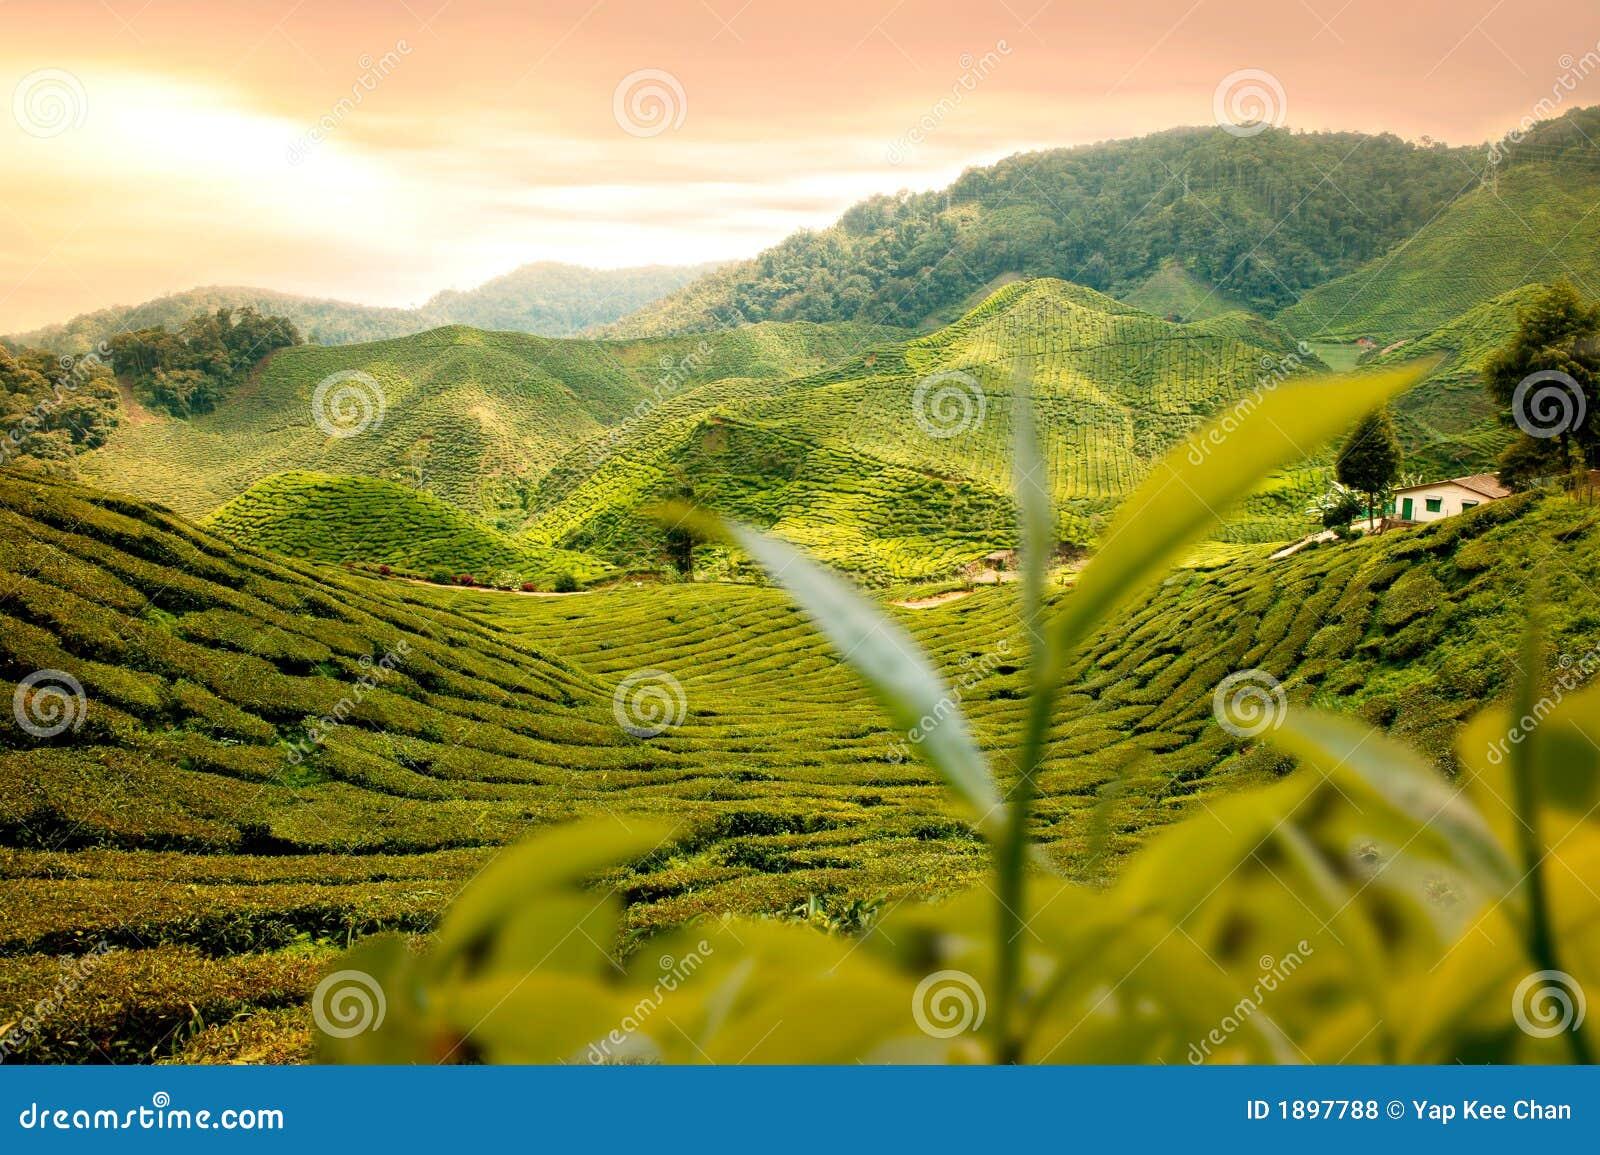 Nature Images 2mb: Tea Garden Stock Photo. Image Of Farm, Beautiful, House